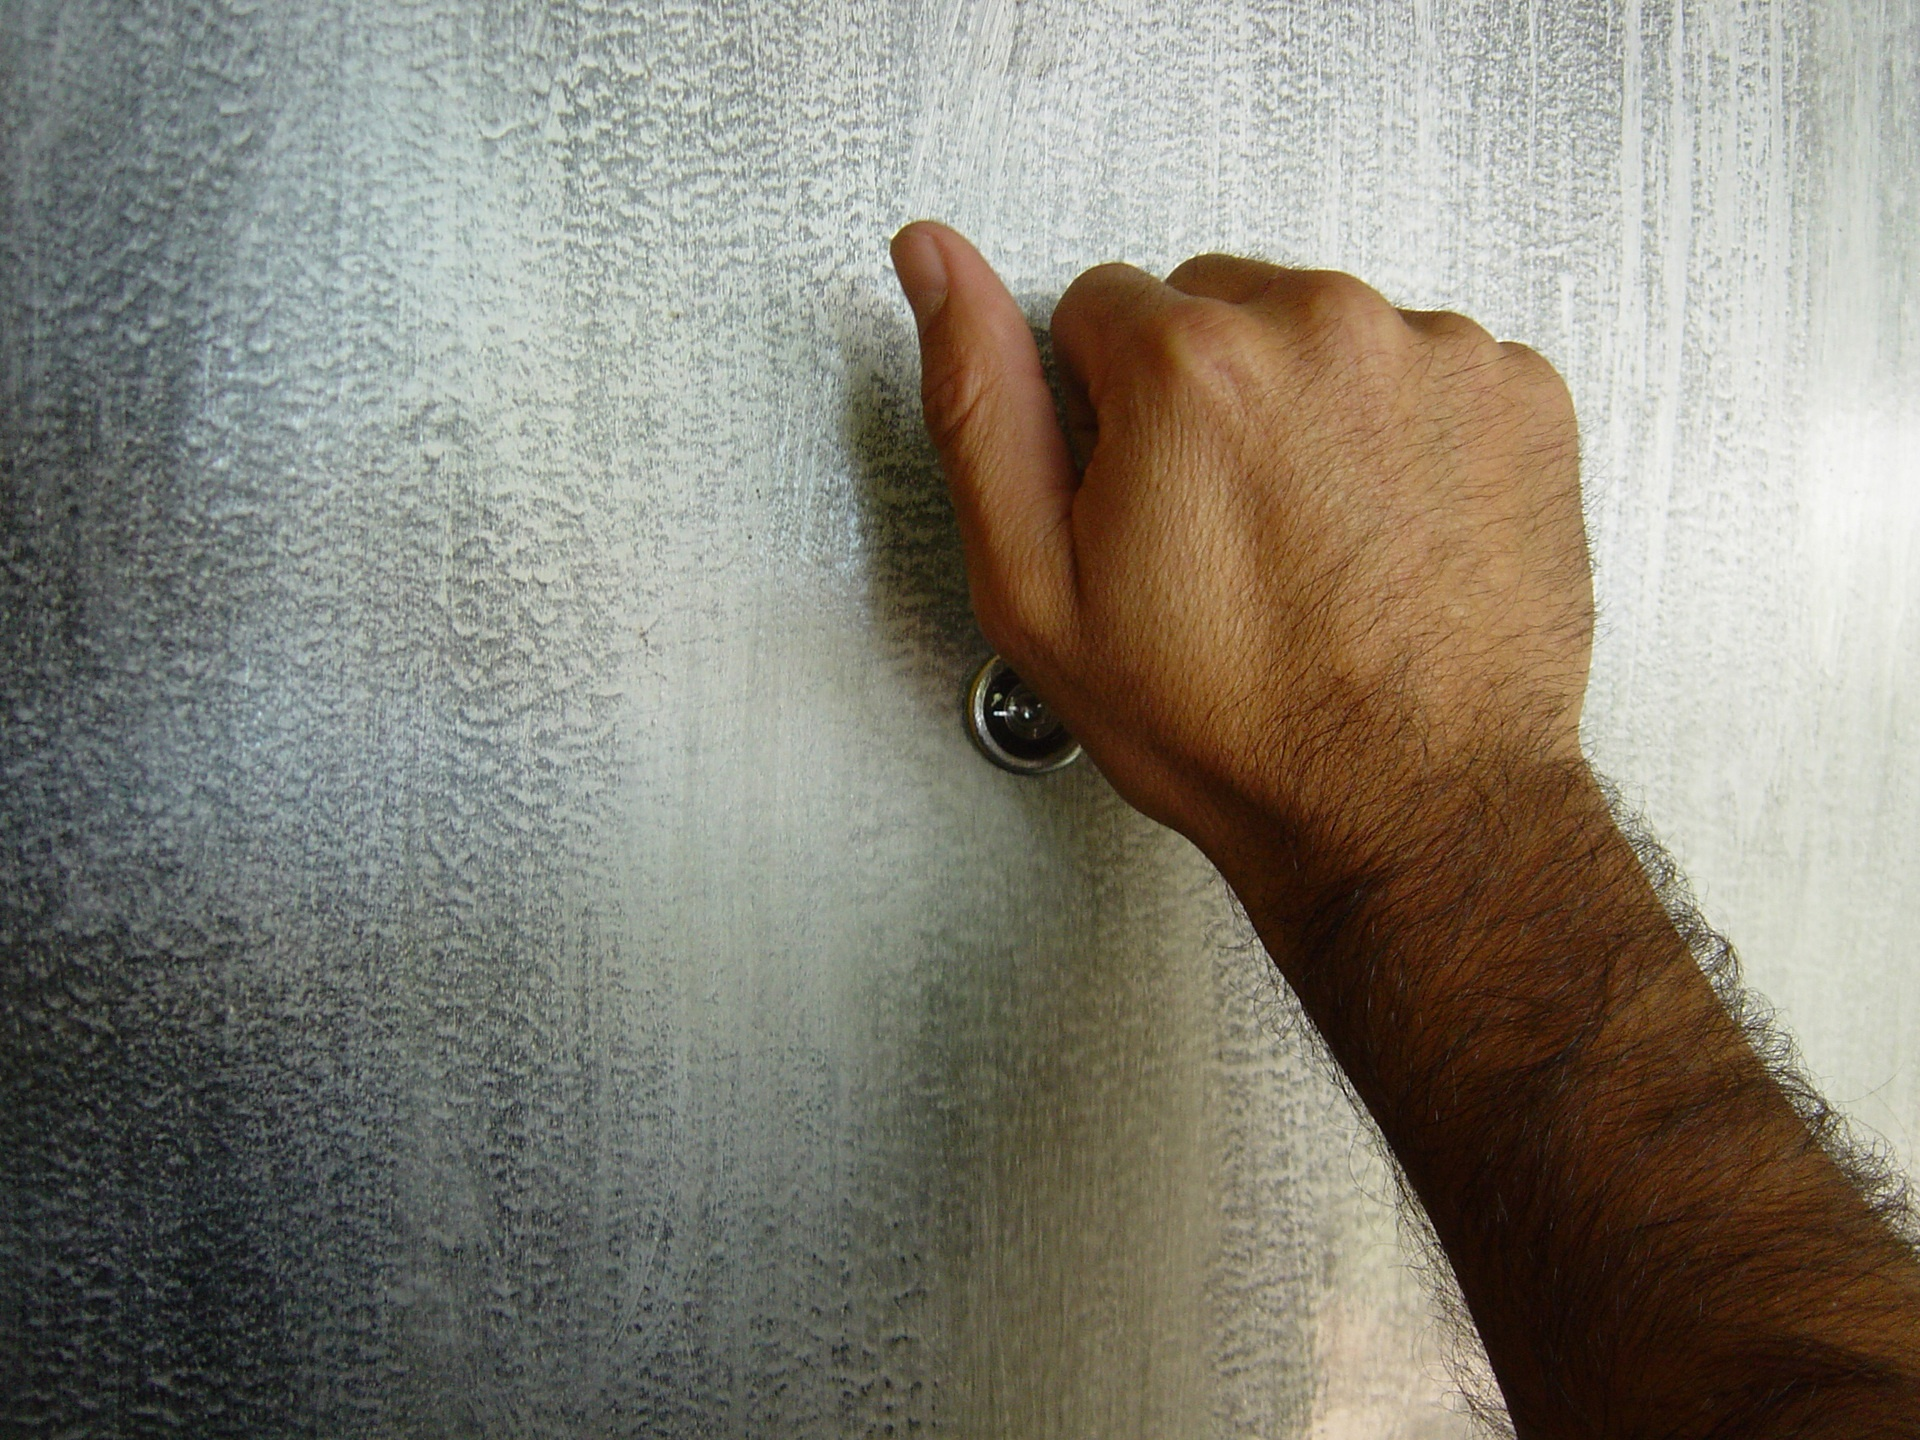 knock-knock-1439837-1920x1440